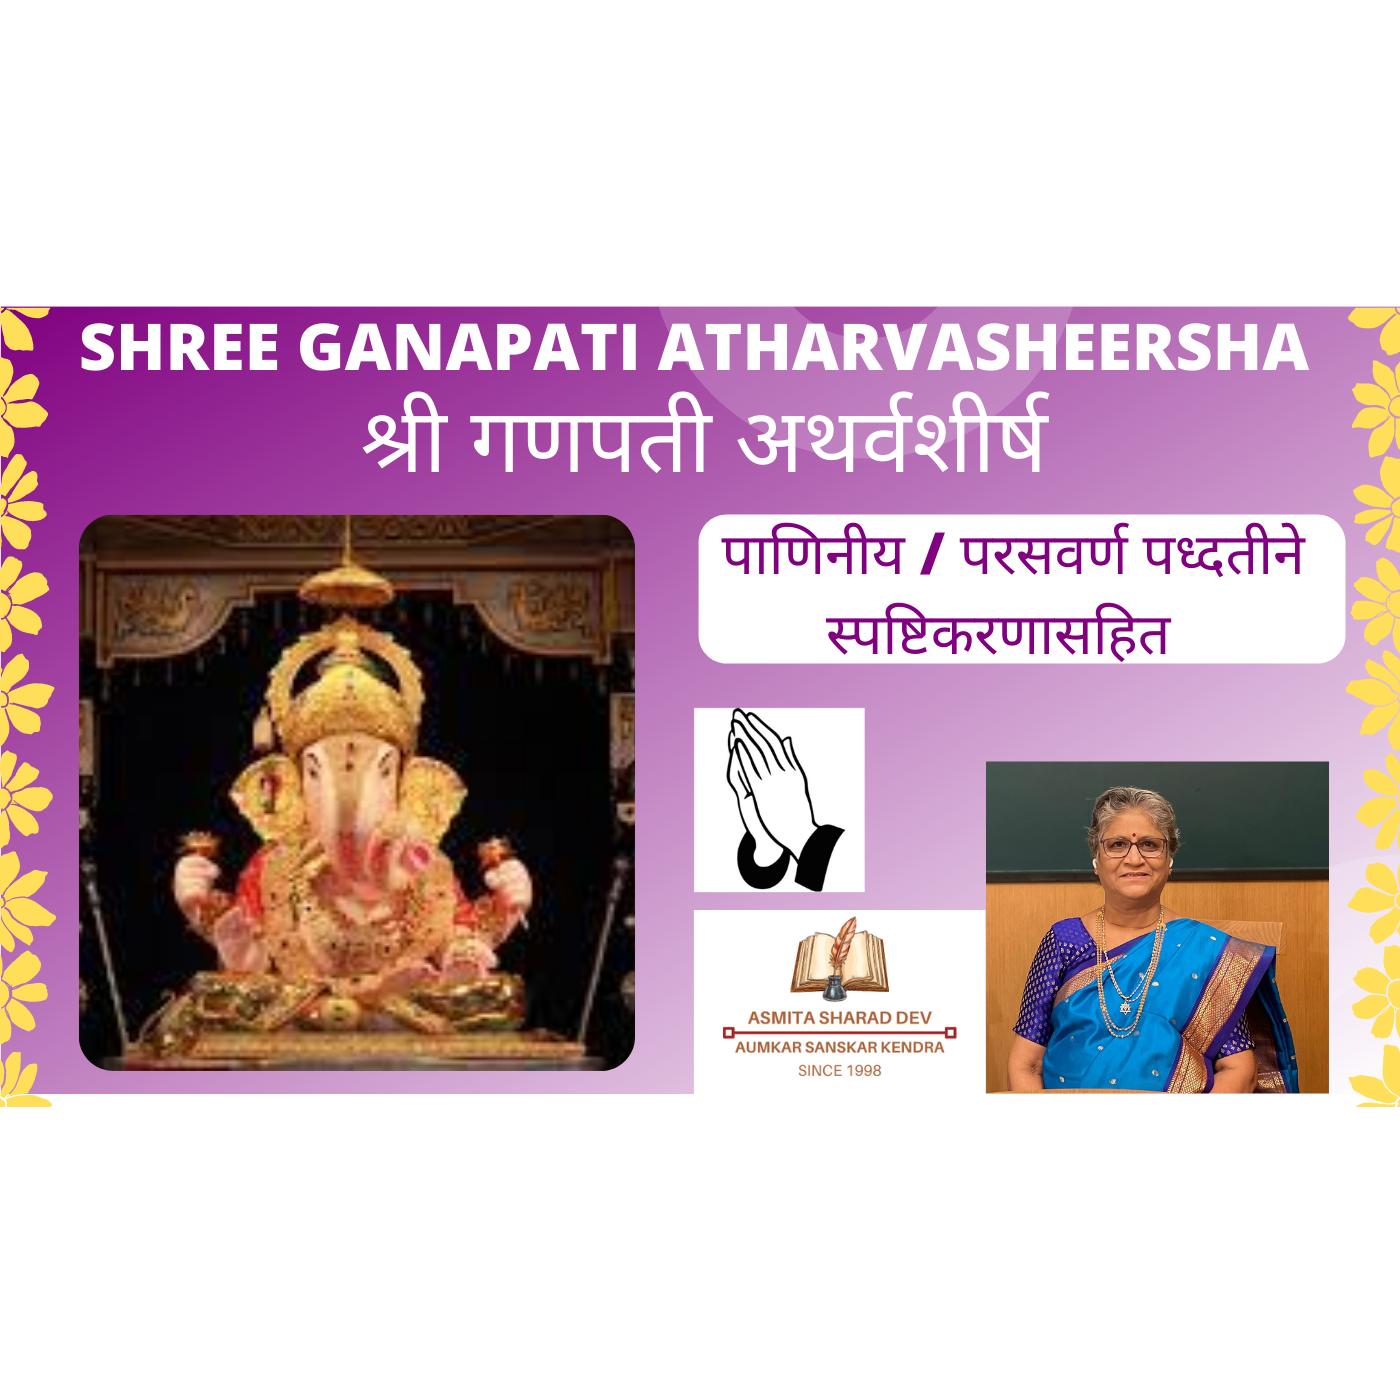 Aumkar Sanskar Kendra - Shree Ganapati Atharvasheersha - पाणिनीय / परसवर्ण पध्दती - गणपती अथर्वशीर्ष - पाणिनीय / परसवर्ण पध्दतीने स्पष्टिकरणासहित